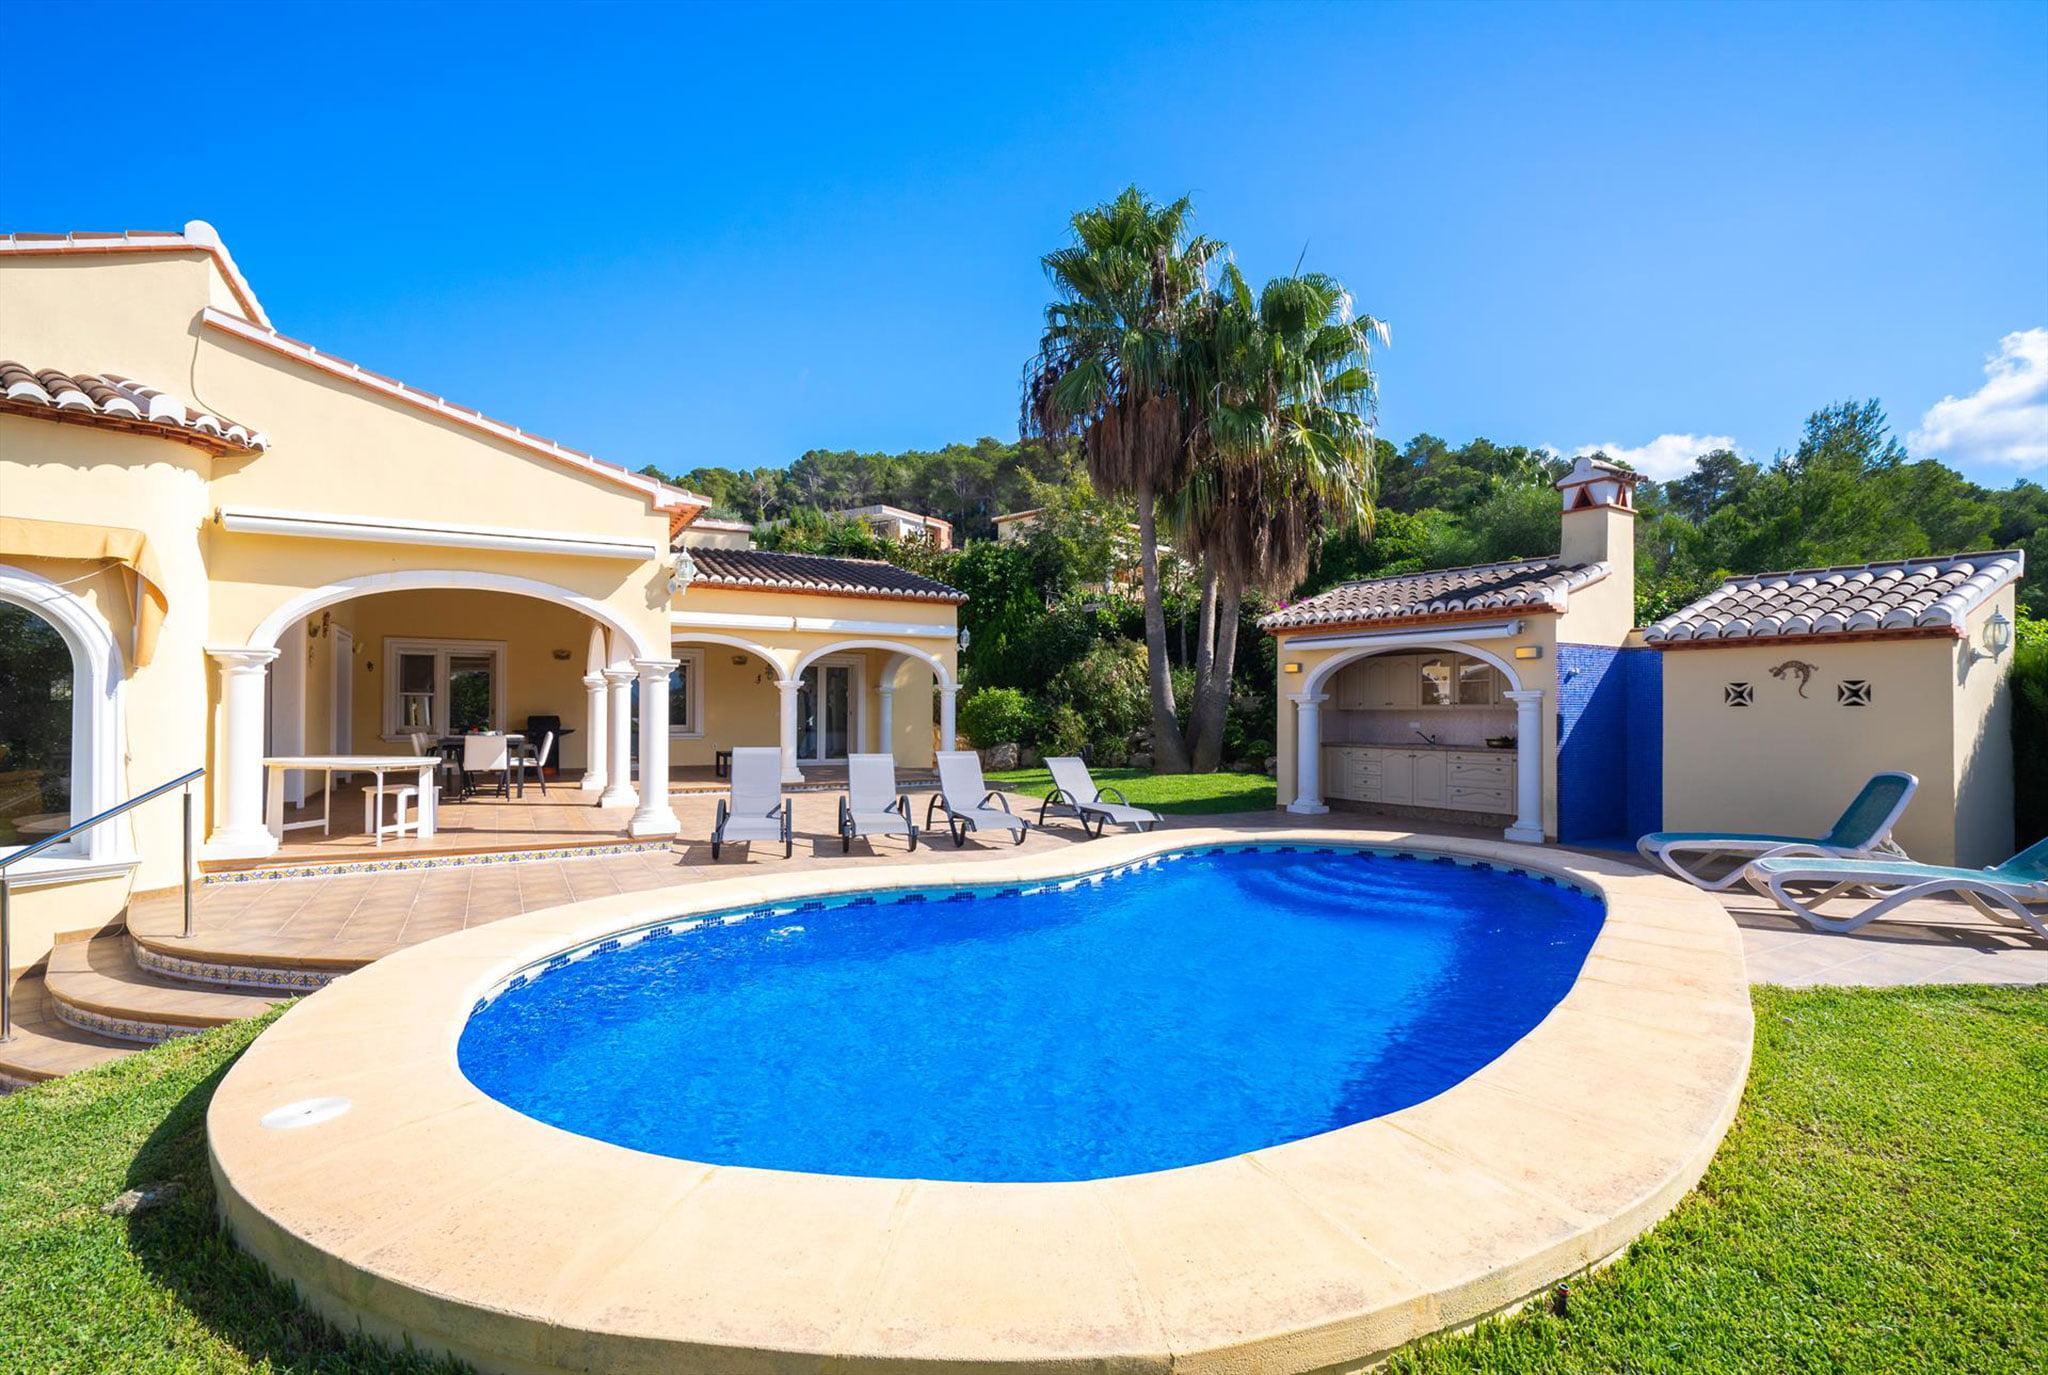 piscina-casa-vacaciones-javea-seis-personas-aguila-rent-a-villa